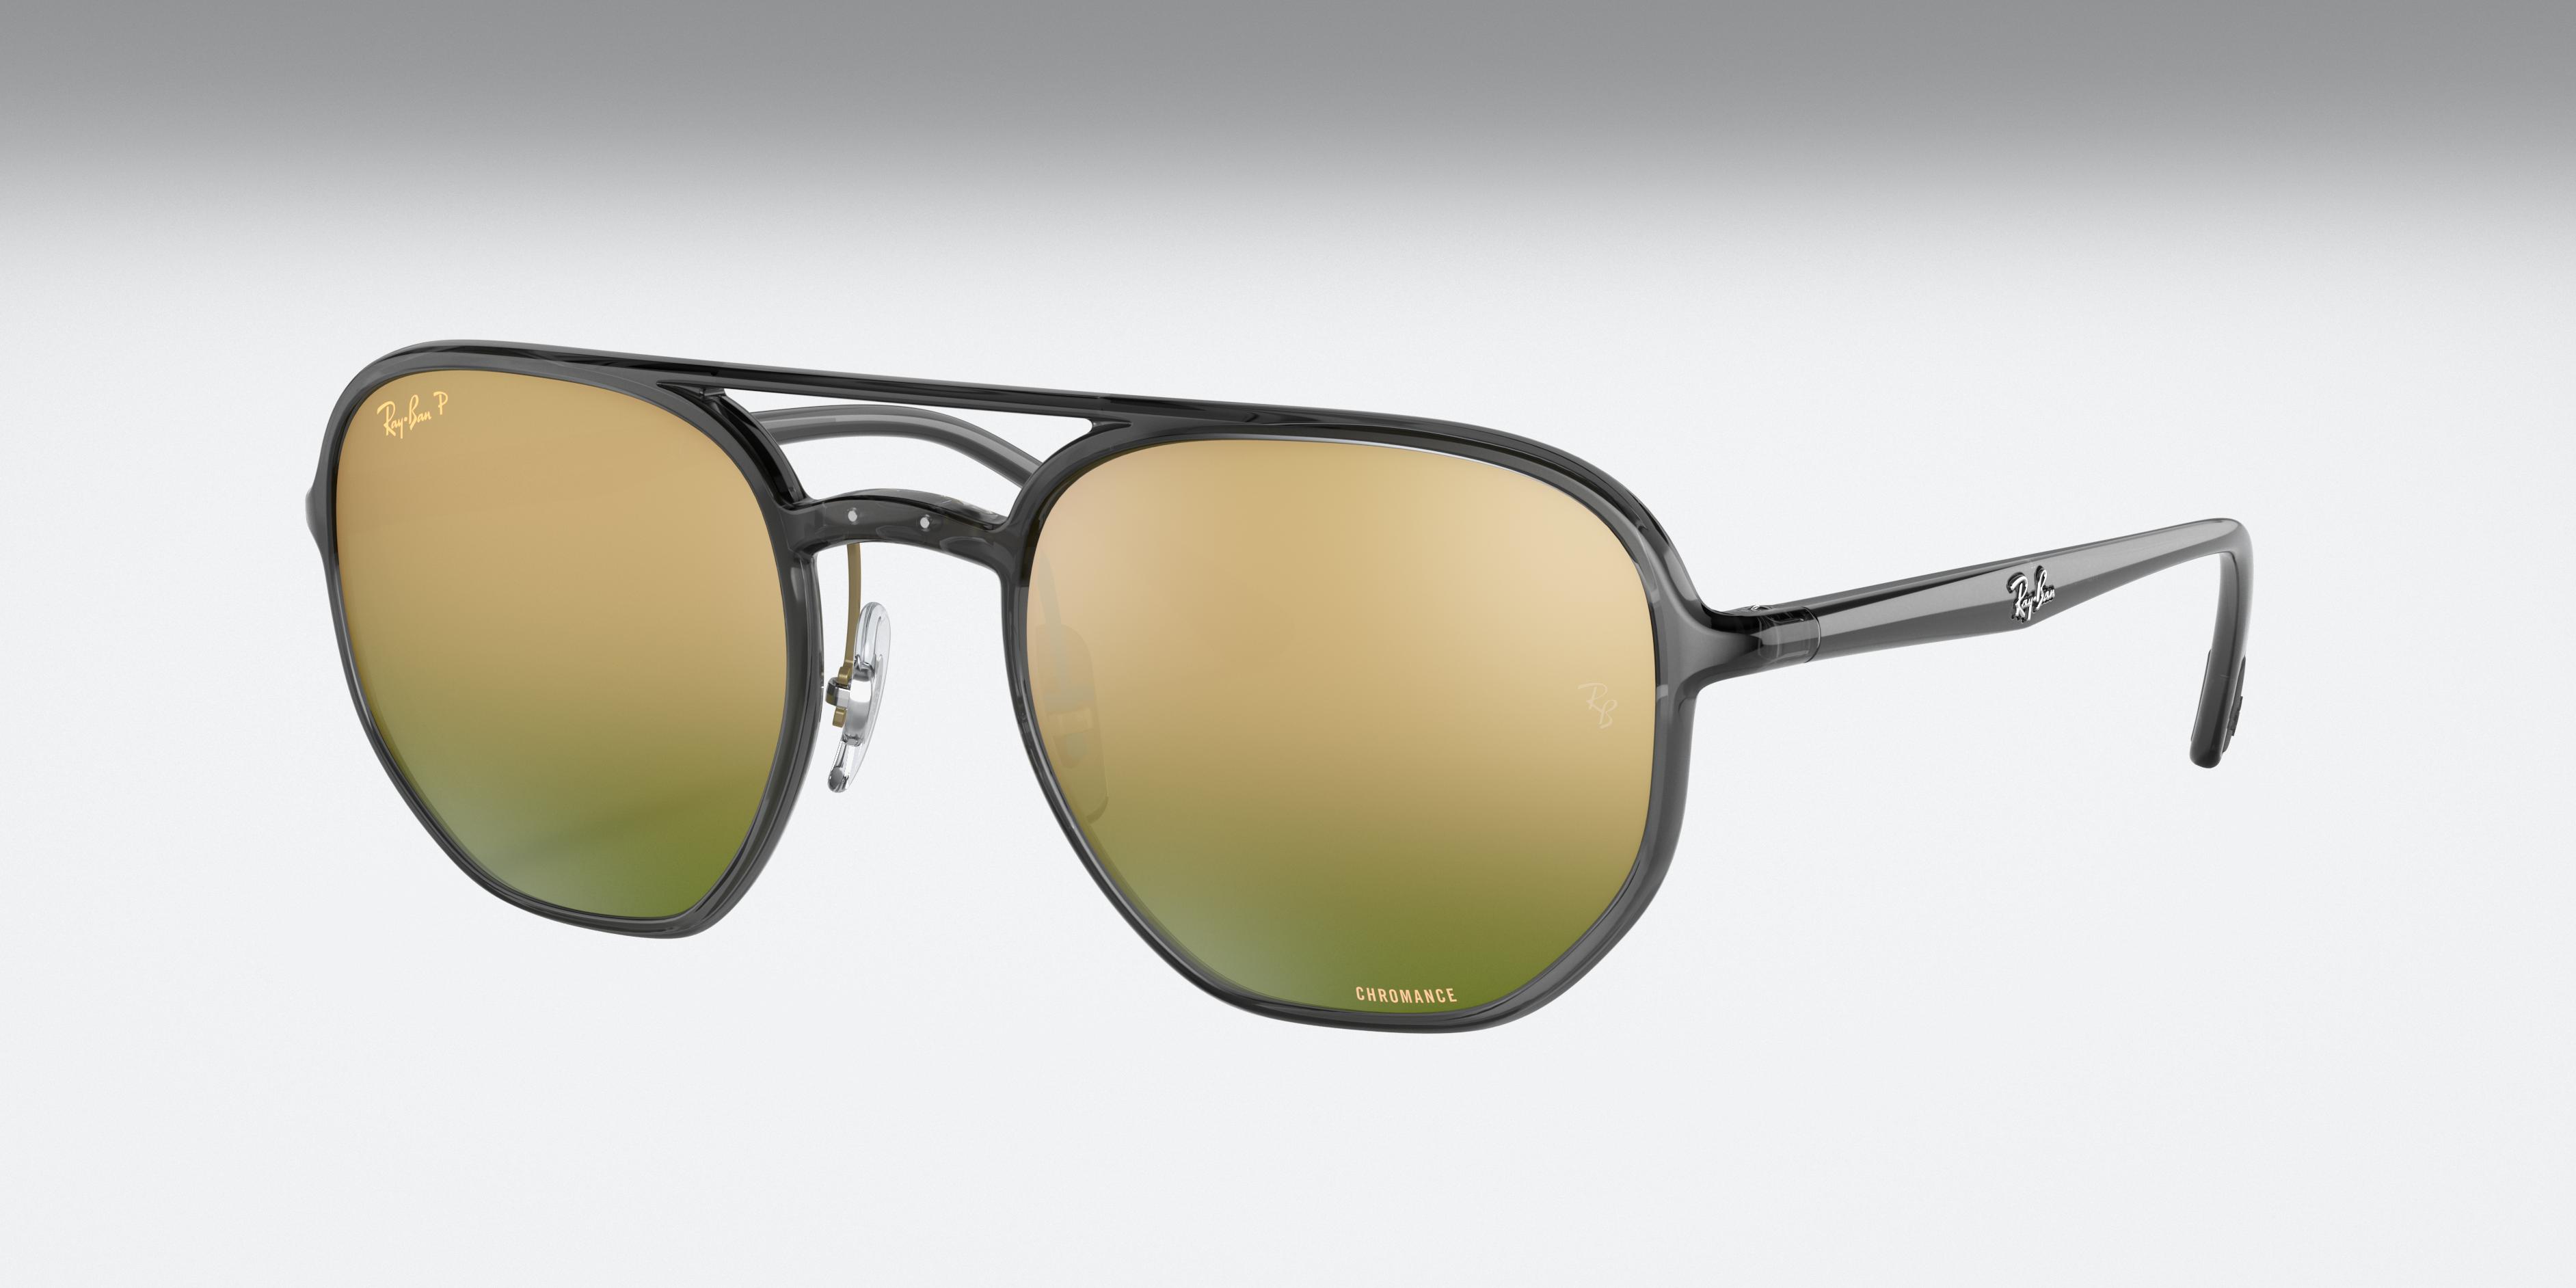 Ray-Ban Rb4321 Chromance Transparent Grey, Polarized Green Lenses - RB4321CH